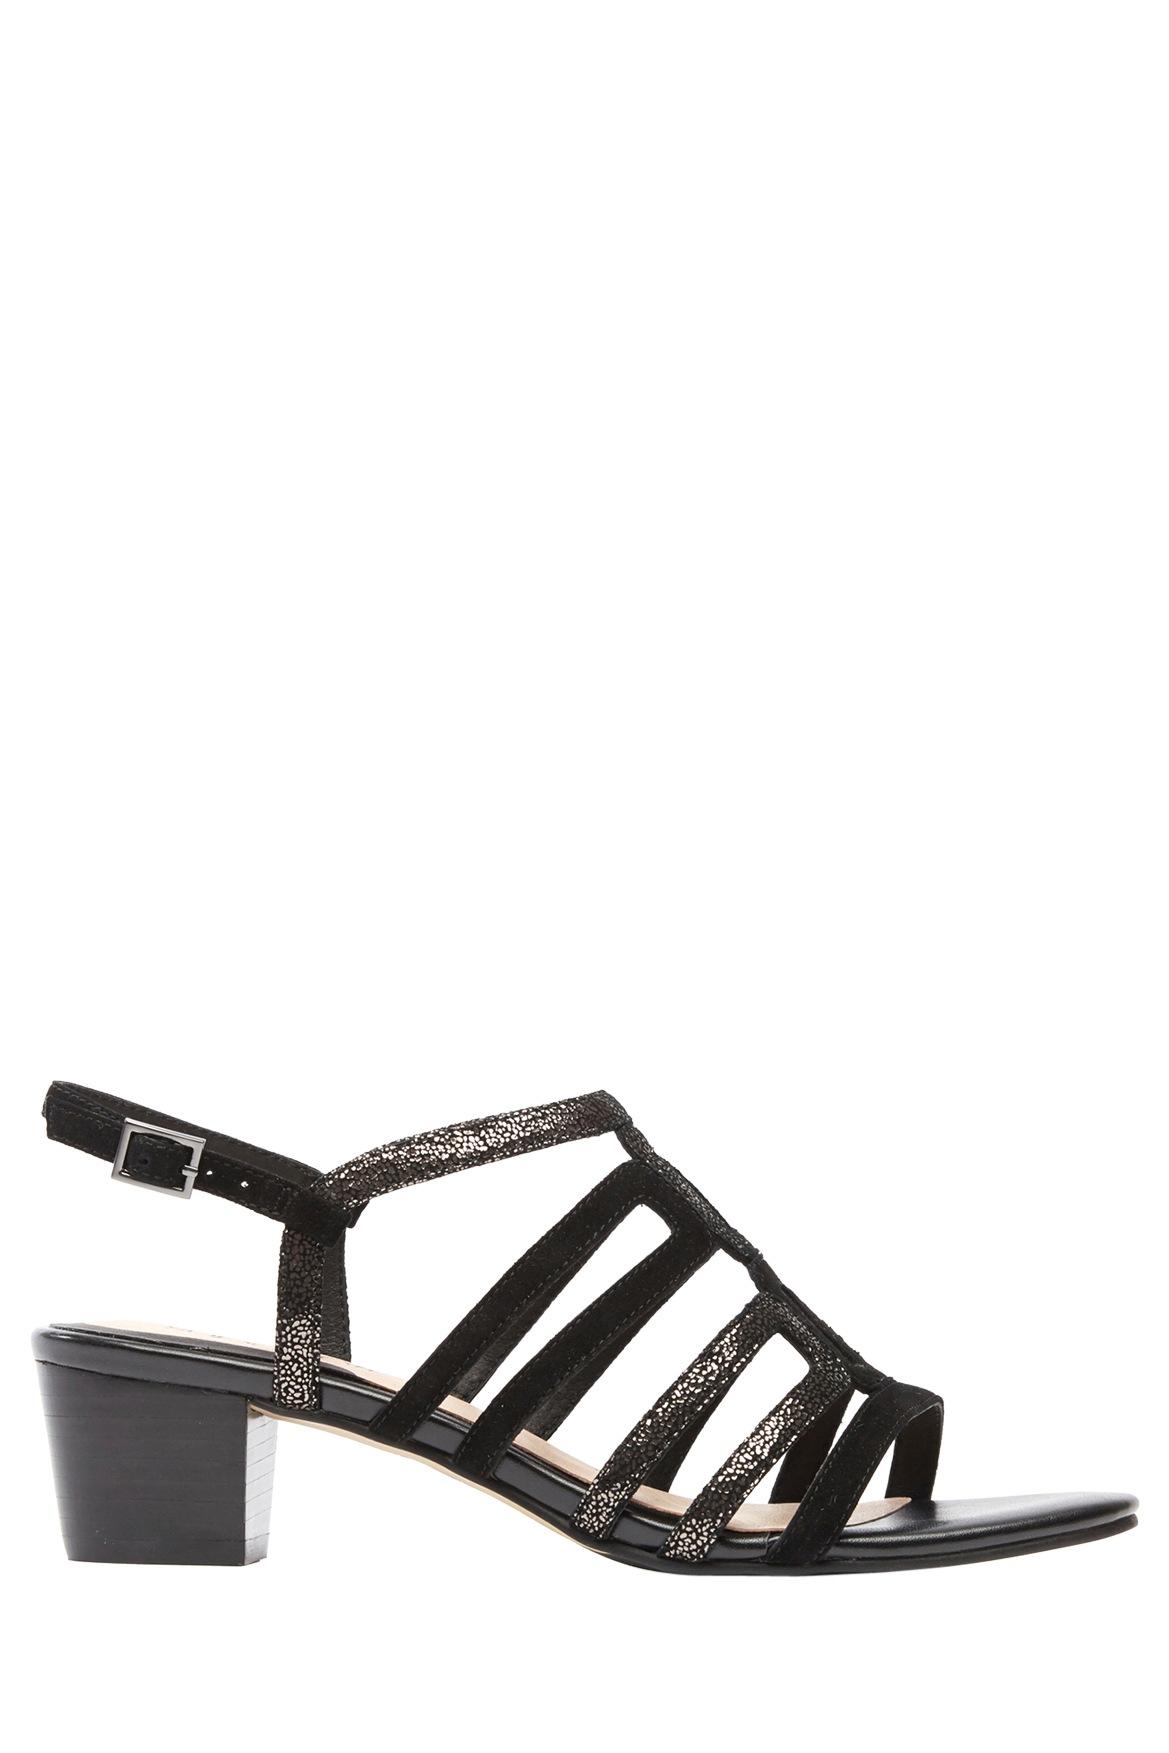 Black sandals myer - Supersoft By Diana Ferrari Ariaane Black Suede Gunmetal Sandal Myer Online